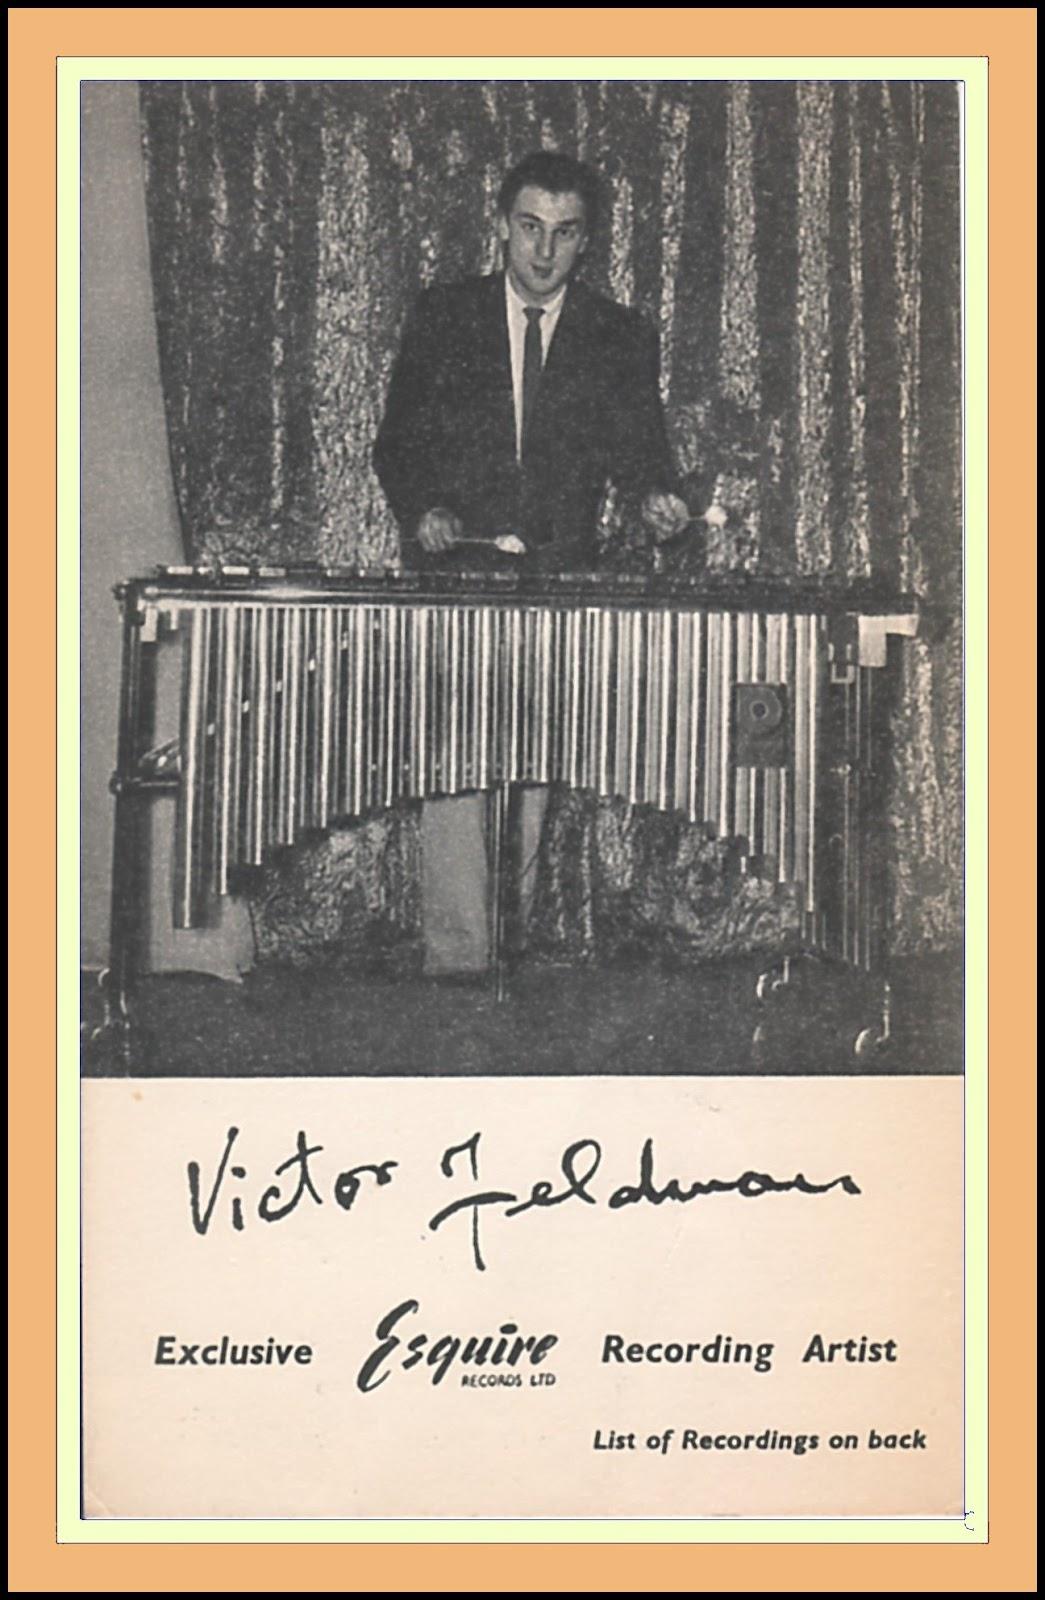 Victor feldman a career overview